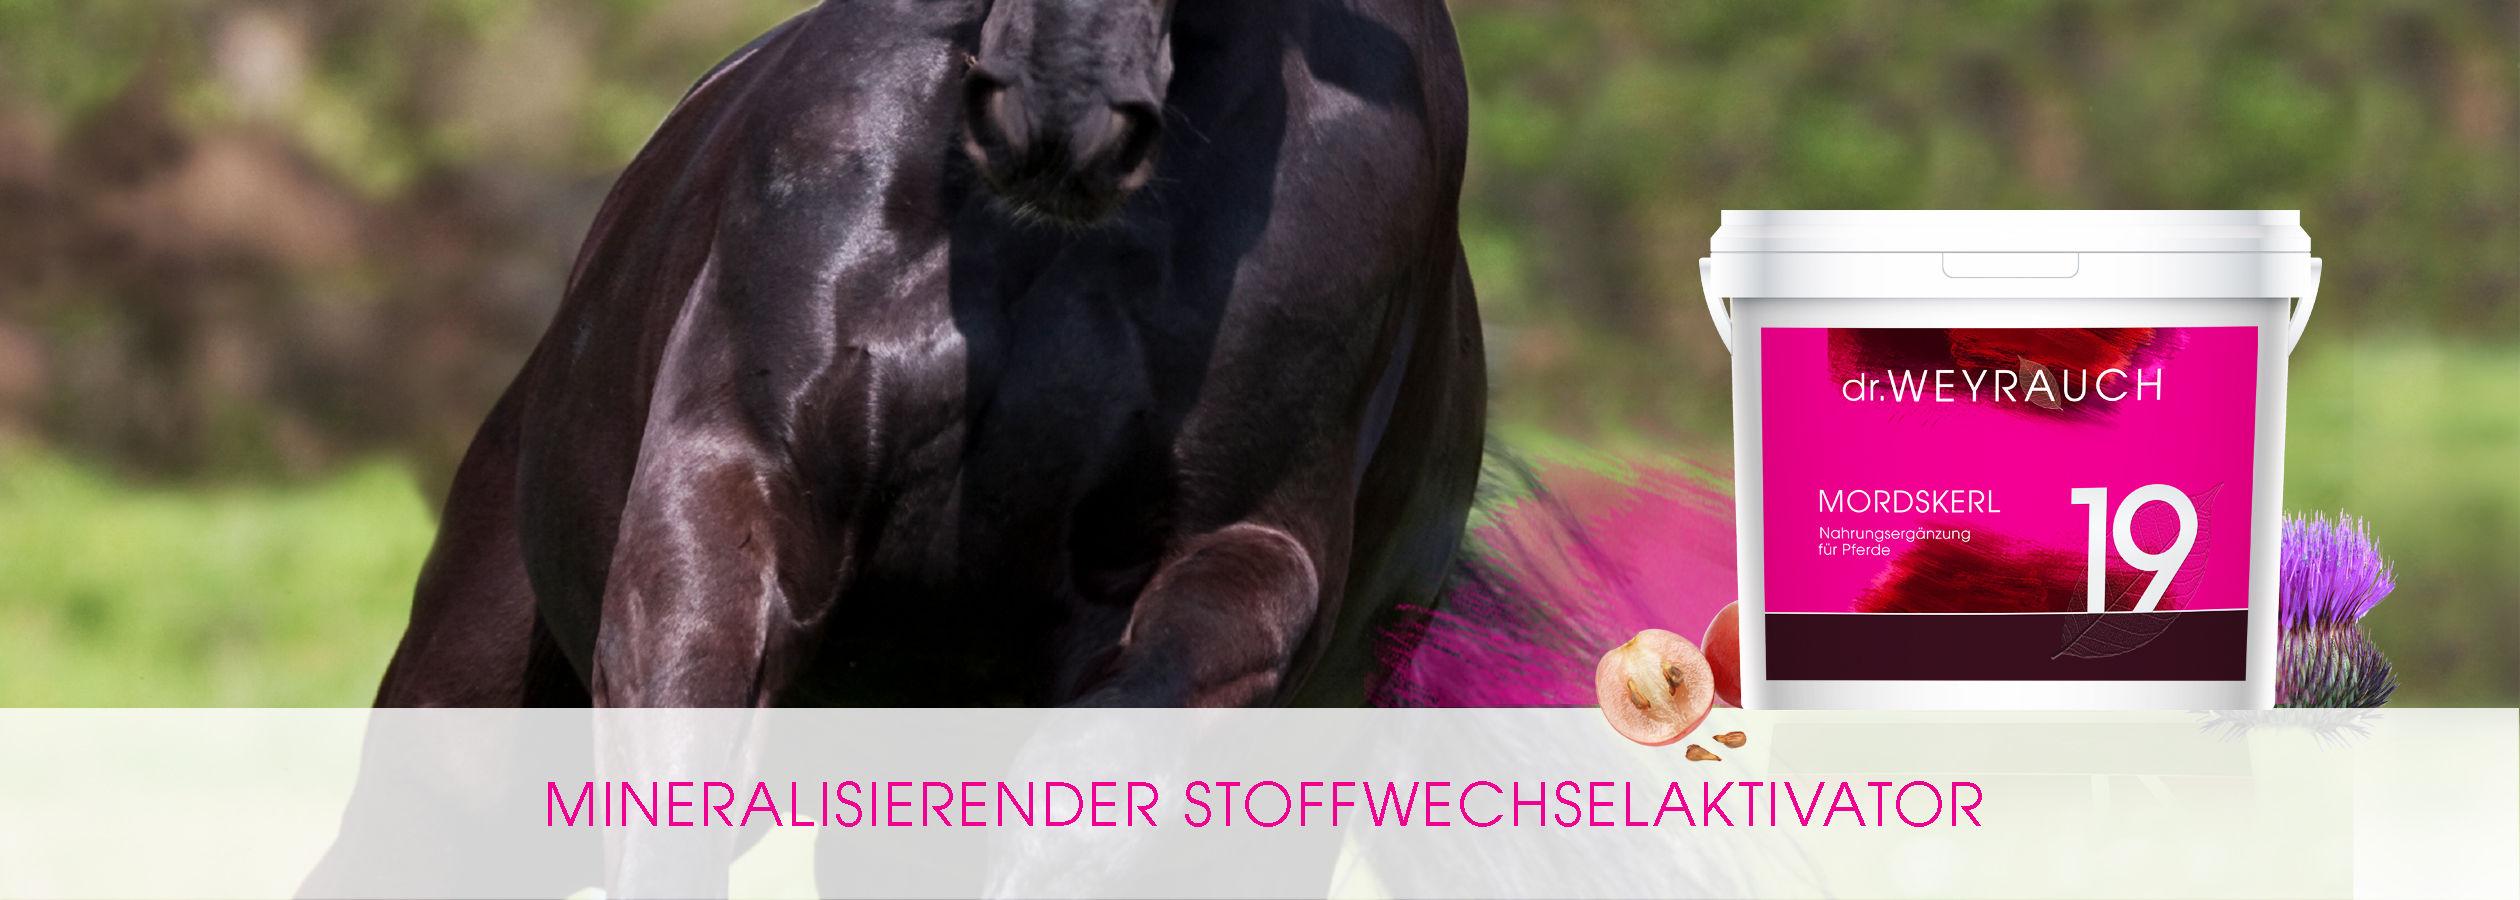 HEADER-2017-Mordskerl-Pferd